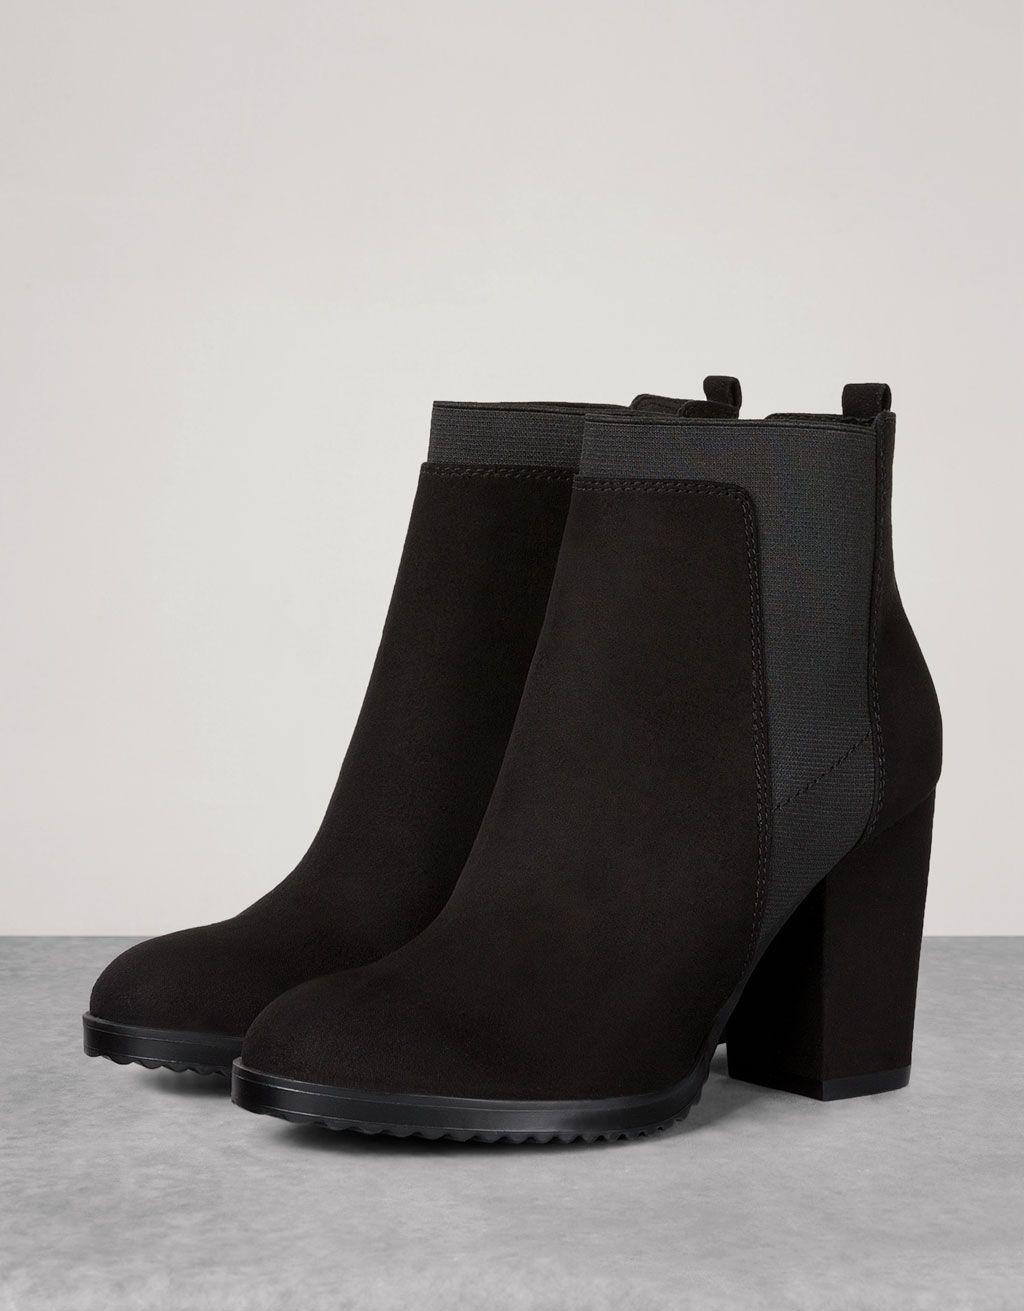 1e30af87601d Bershka Austria - Bershka mid heel elastic ankle boots